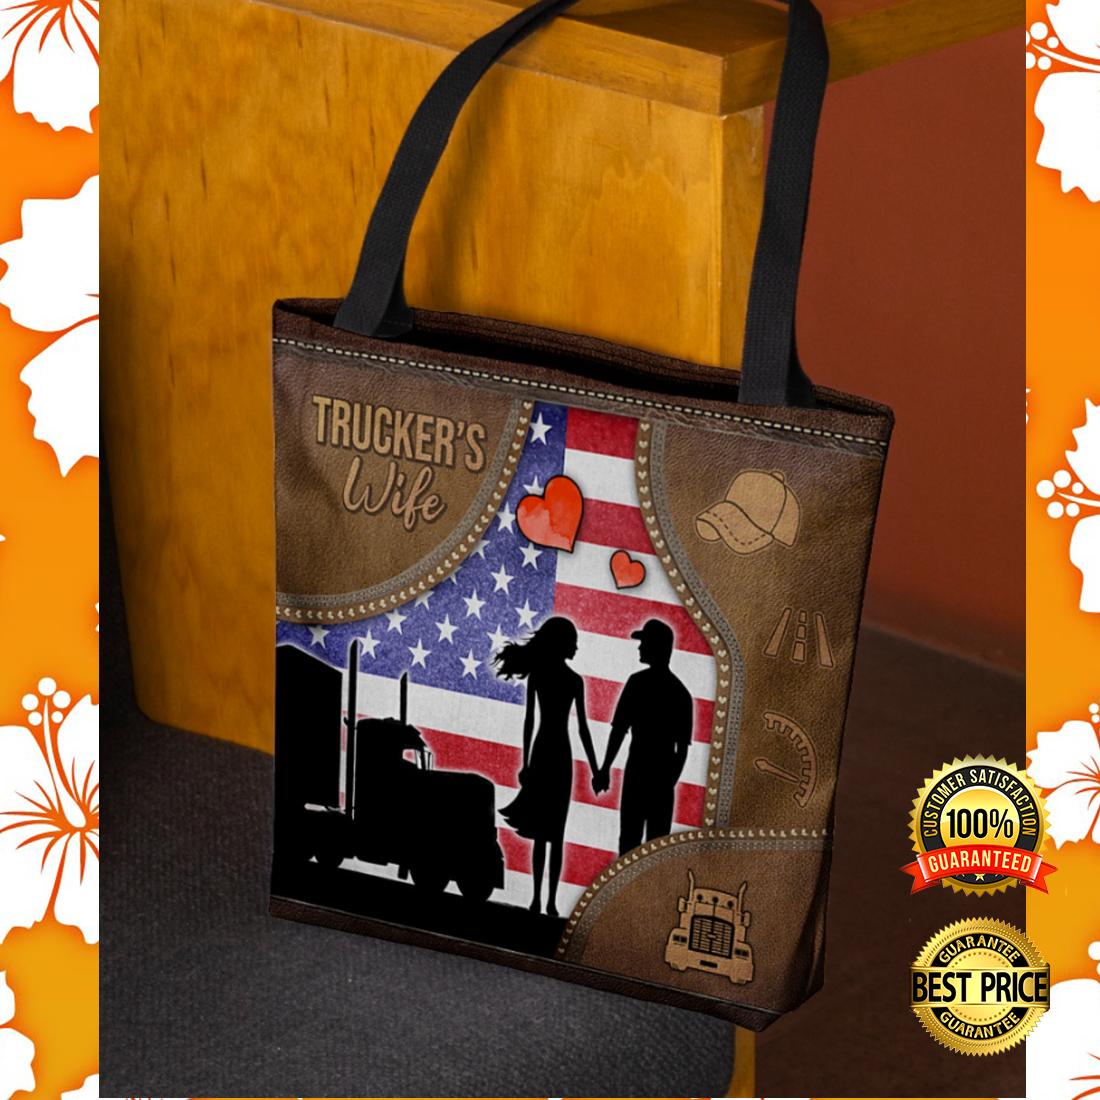 Trucker's wife tote bag 5